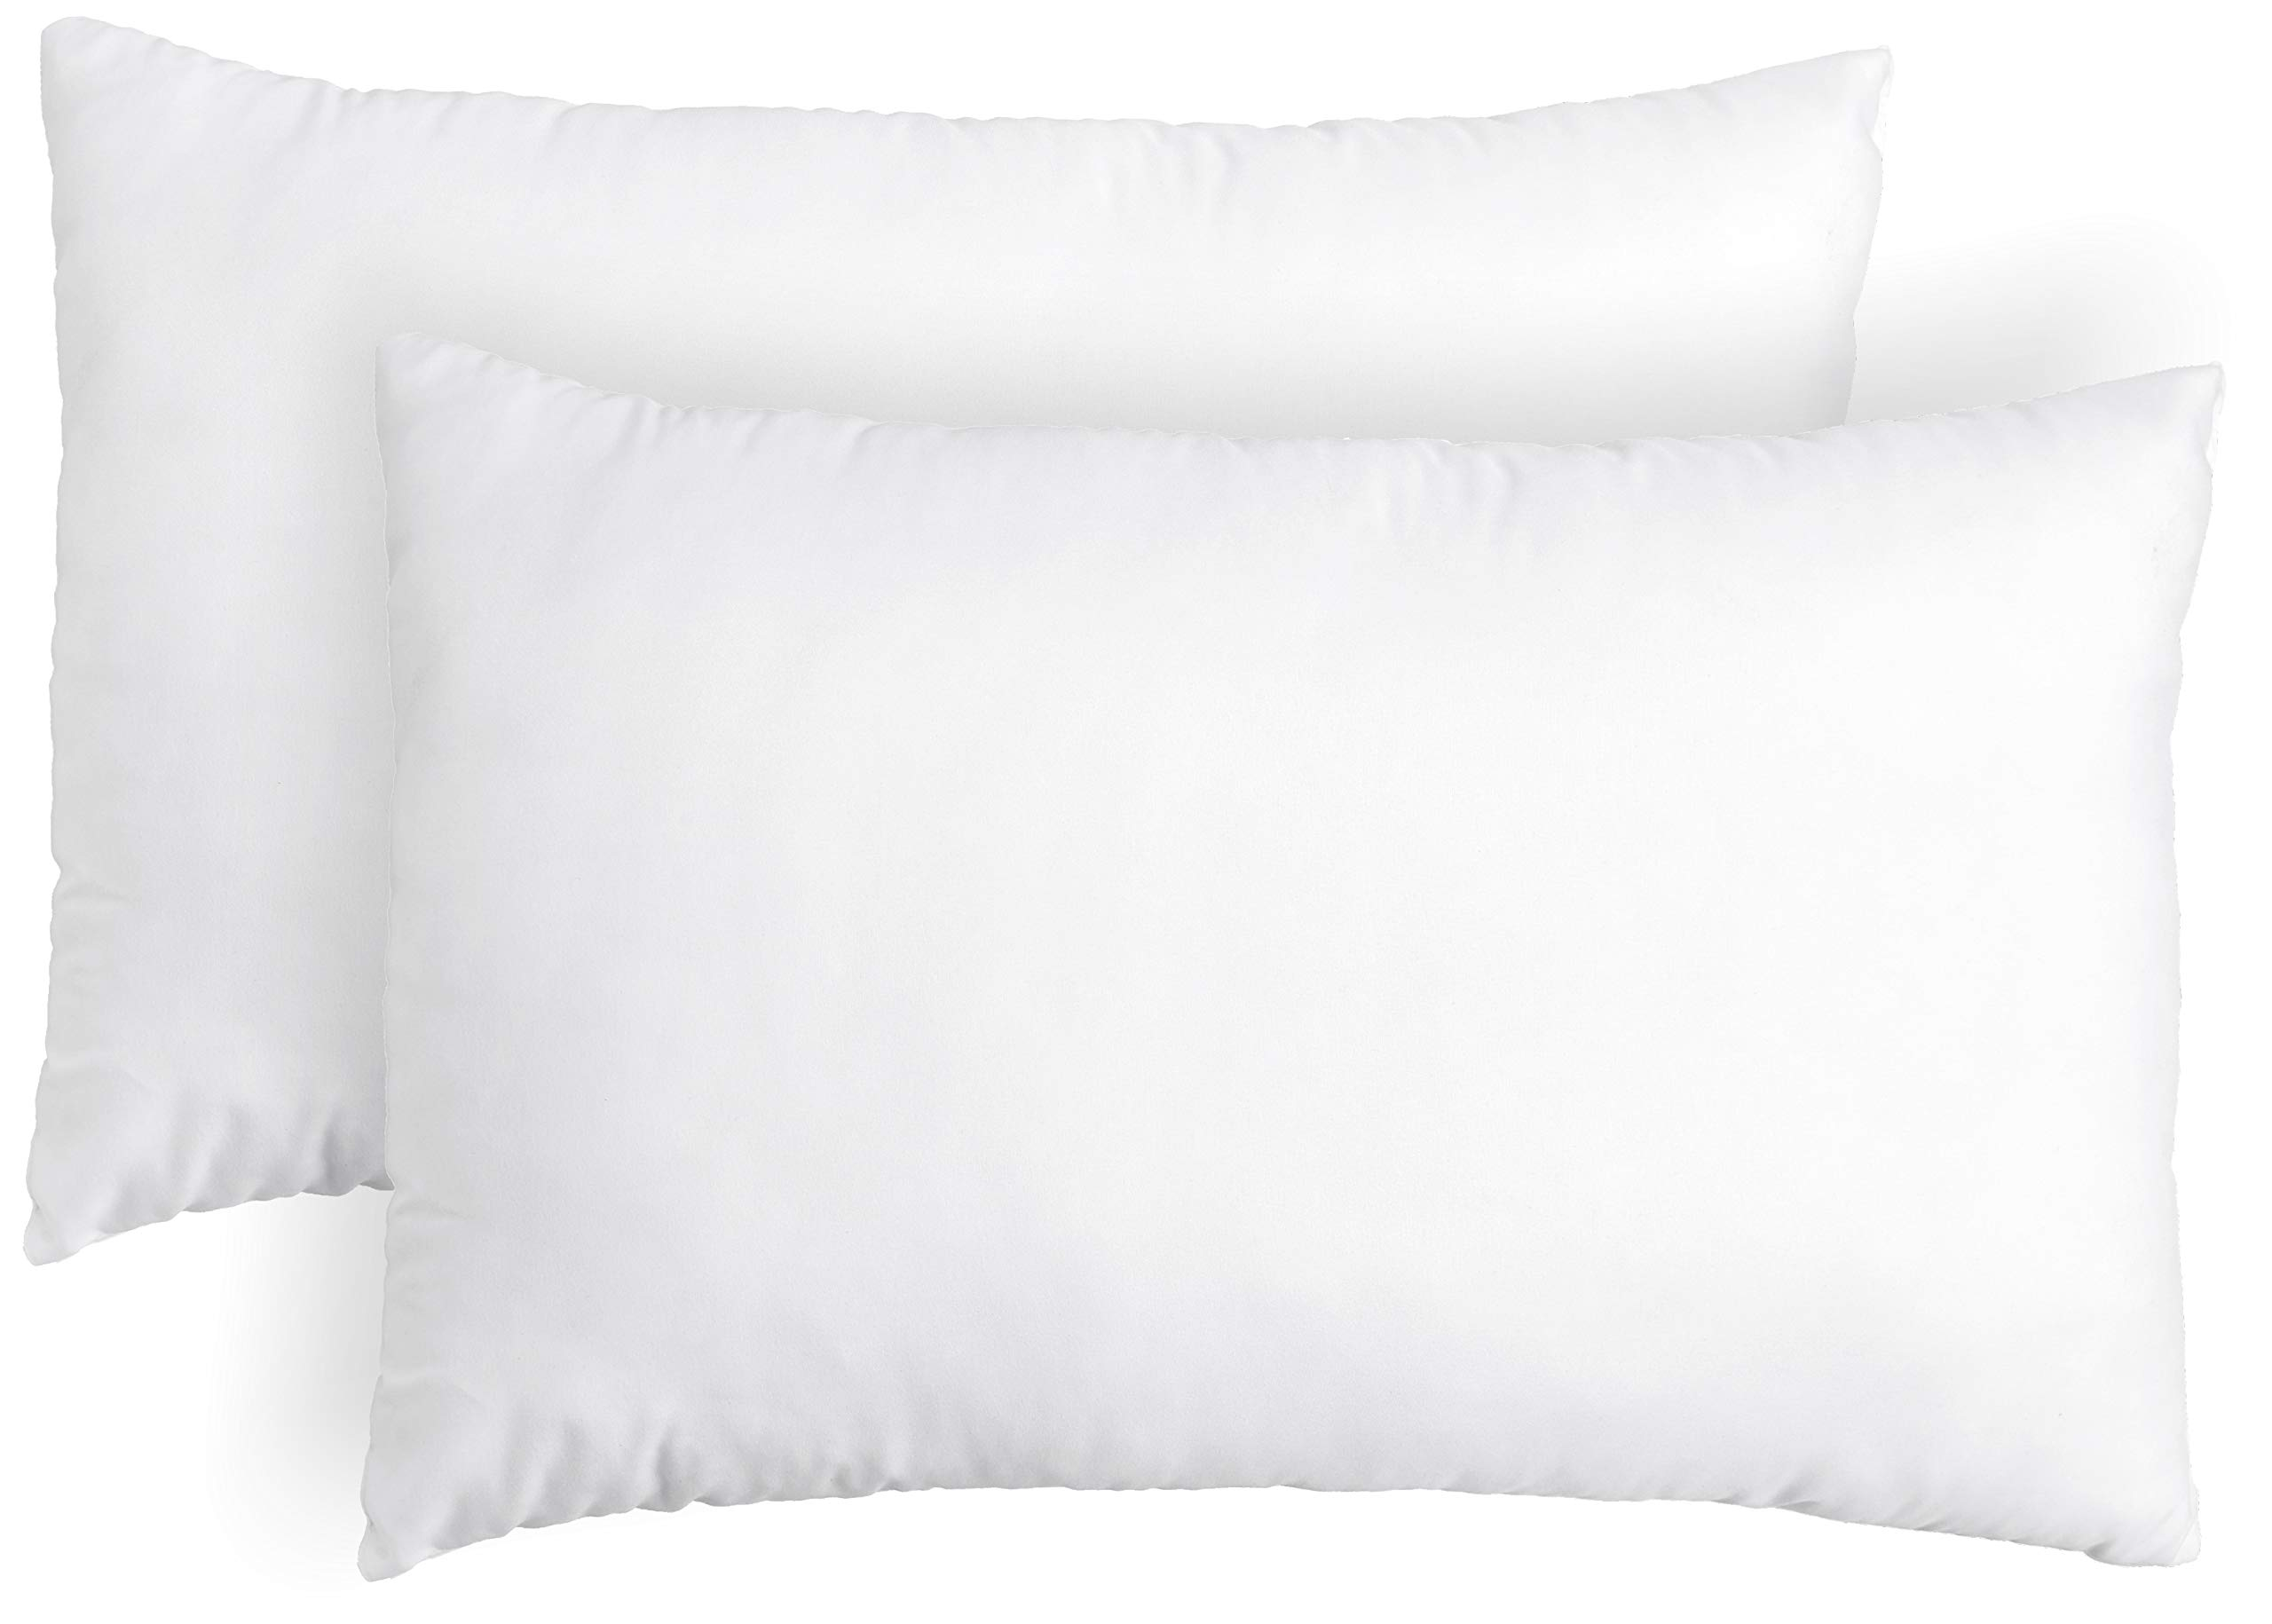 Amazon Brand - Solimo 2-Piece Bed Pillow Set - 40 x 60 cm, White (B07G4K7B1G) Amazon Price History, Amazon Price Tracker